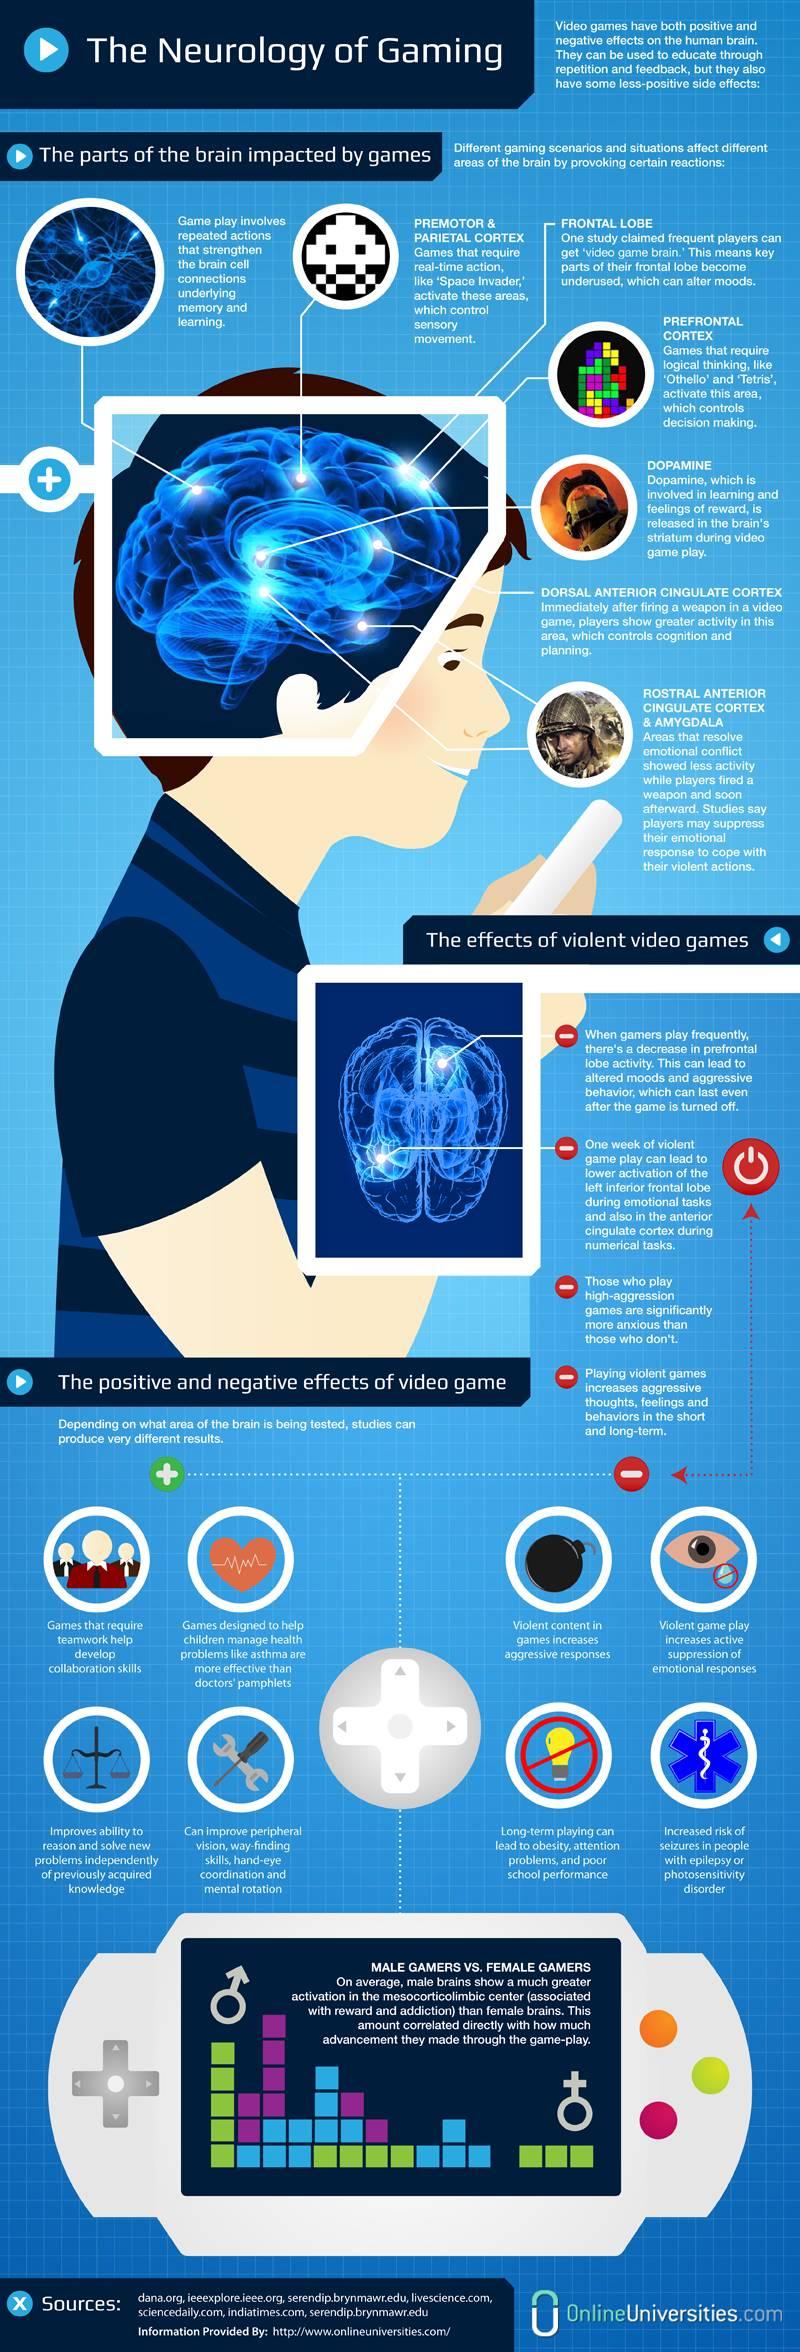 Optimized-Neurology-of-Gaming-800